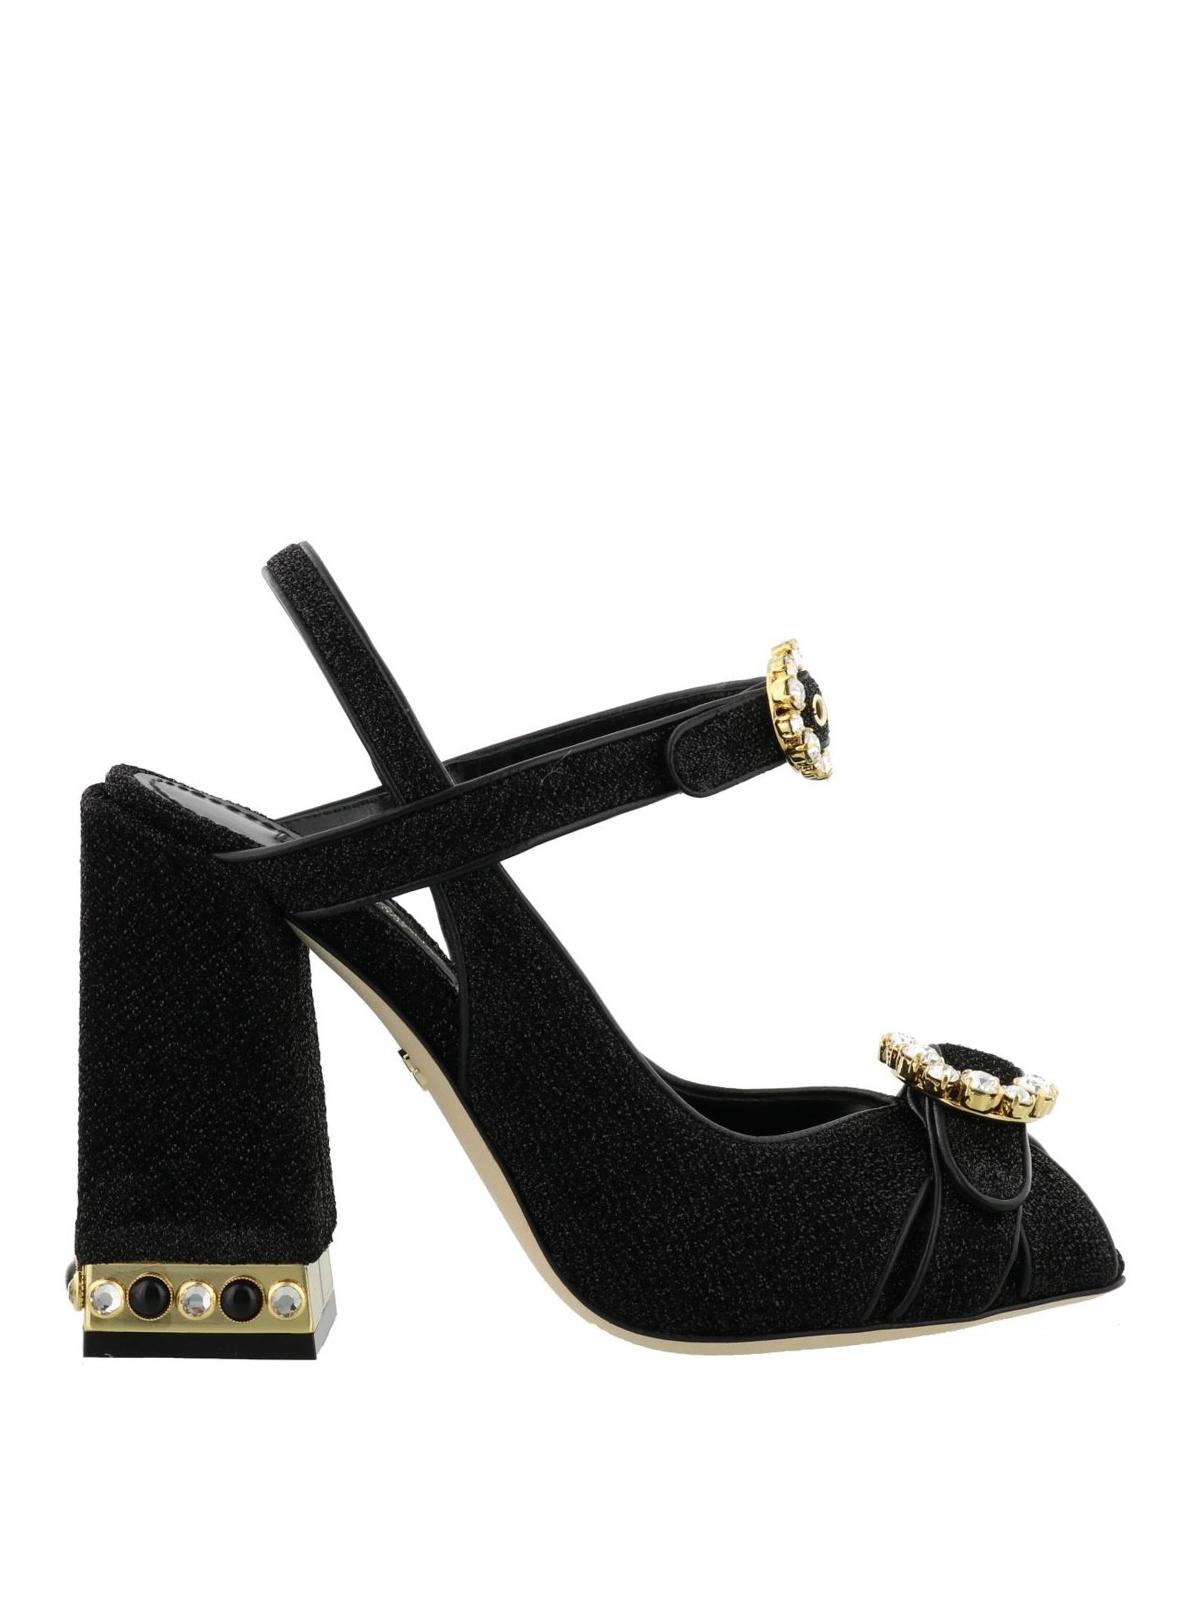 e18fe501f59c Dolce   Gabbana - Bette peep toe jewel lurex sandals - sandals ...